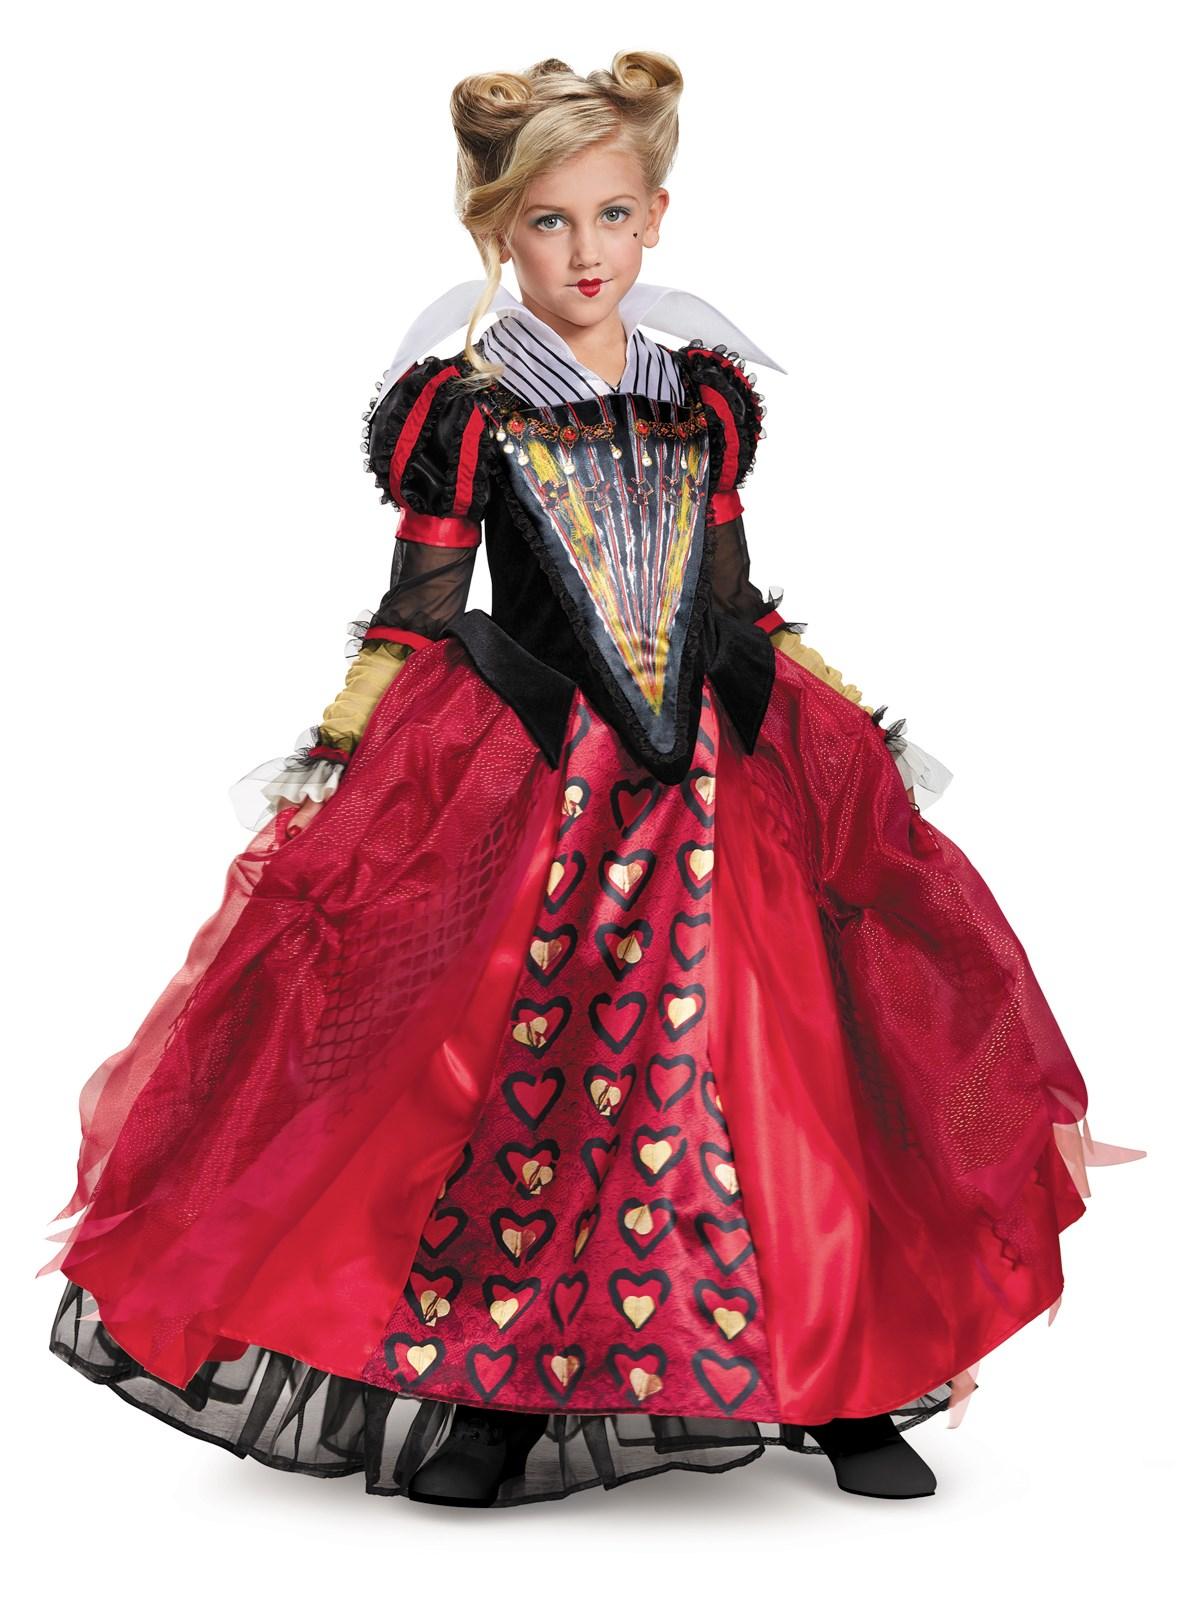 Girls Costumes For Halloween   BuyCostumes.com